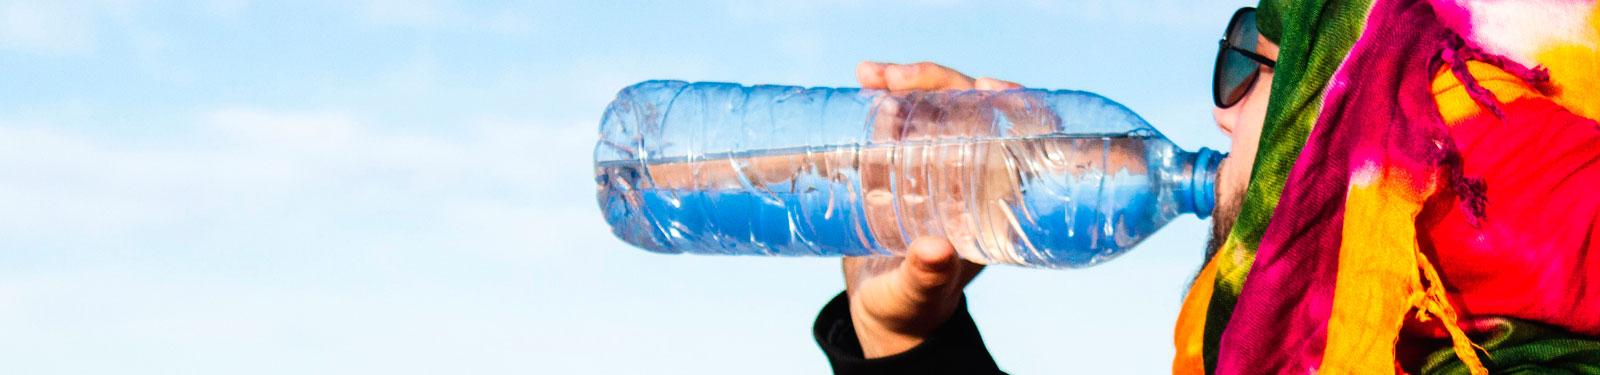 datos importantes del agua